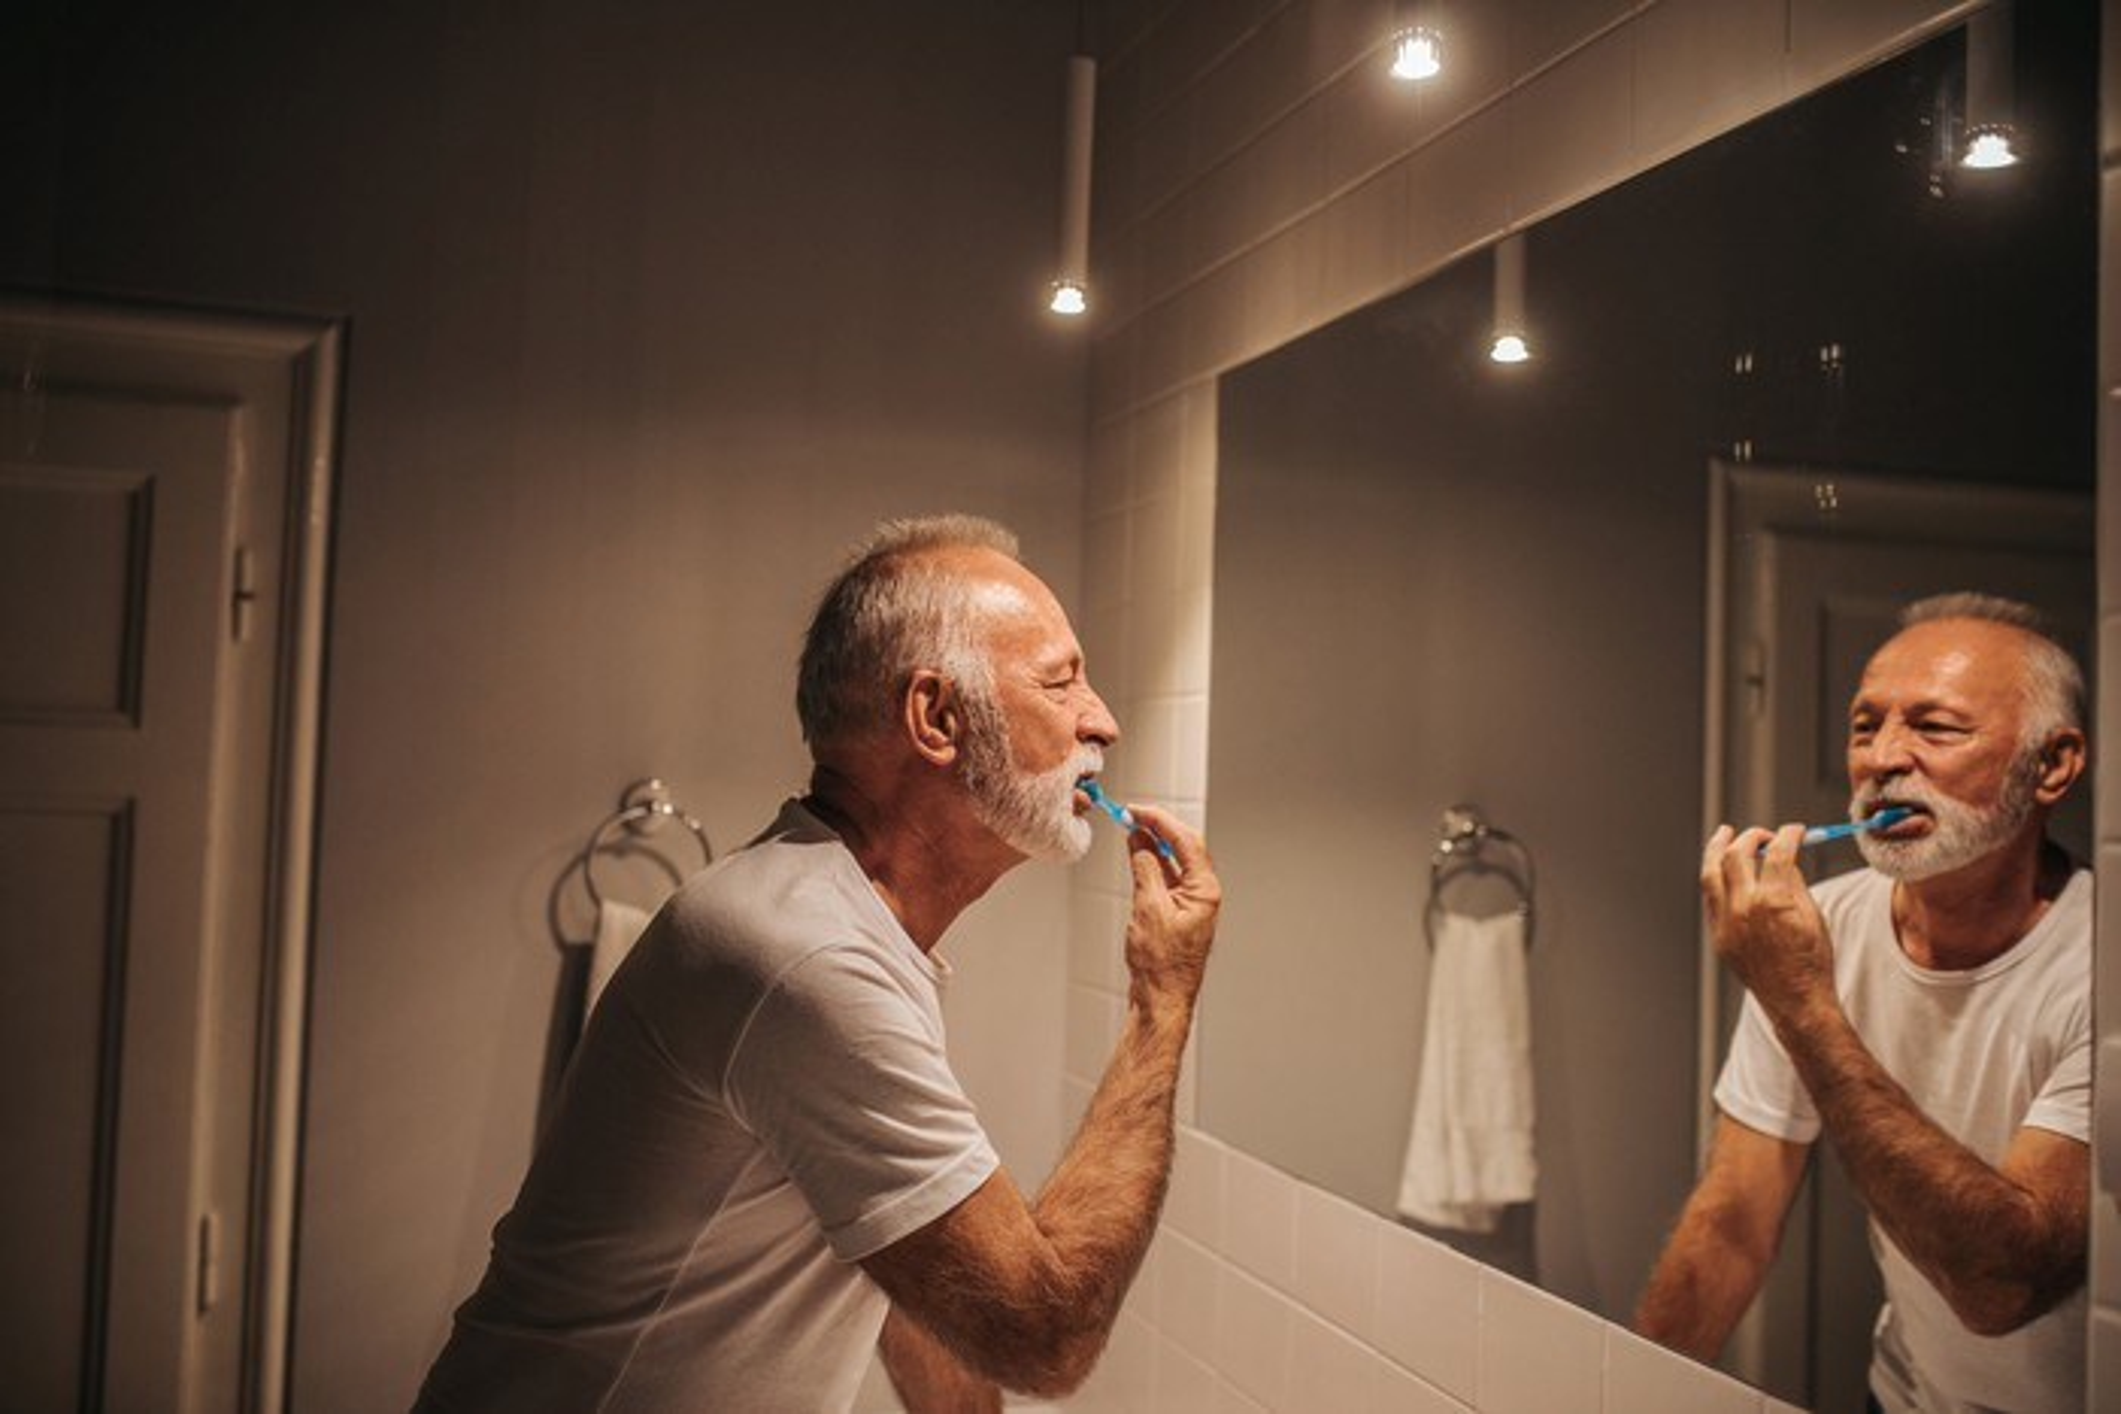 A senior man looks in the bathroom mirror as he brushes his teeth.